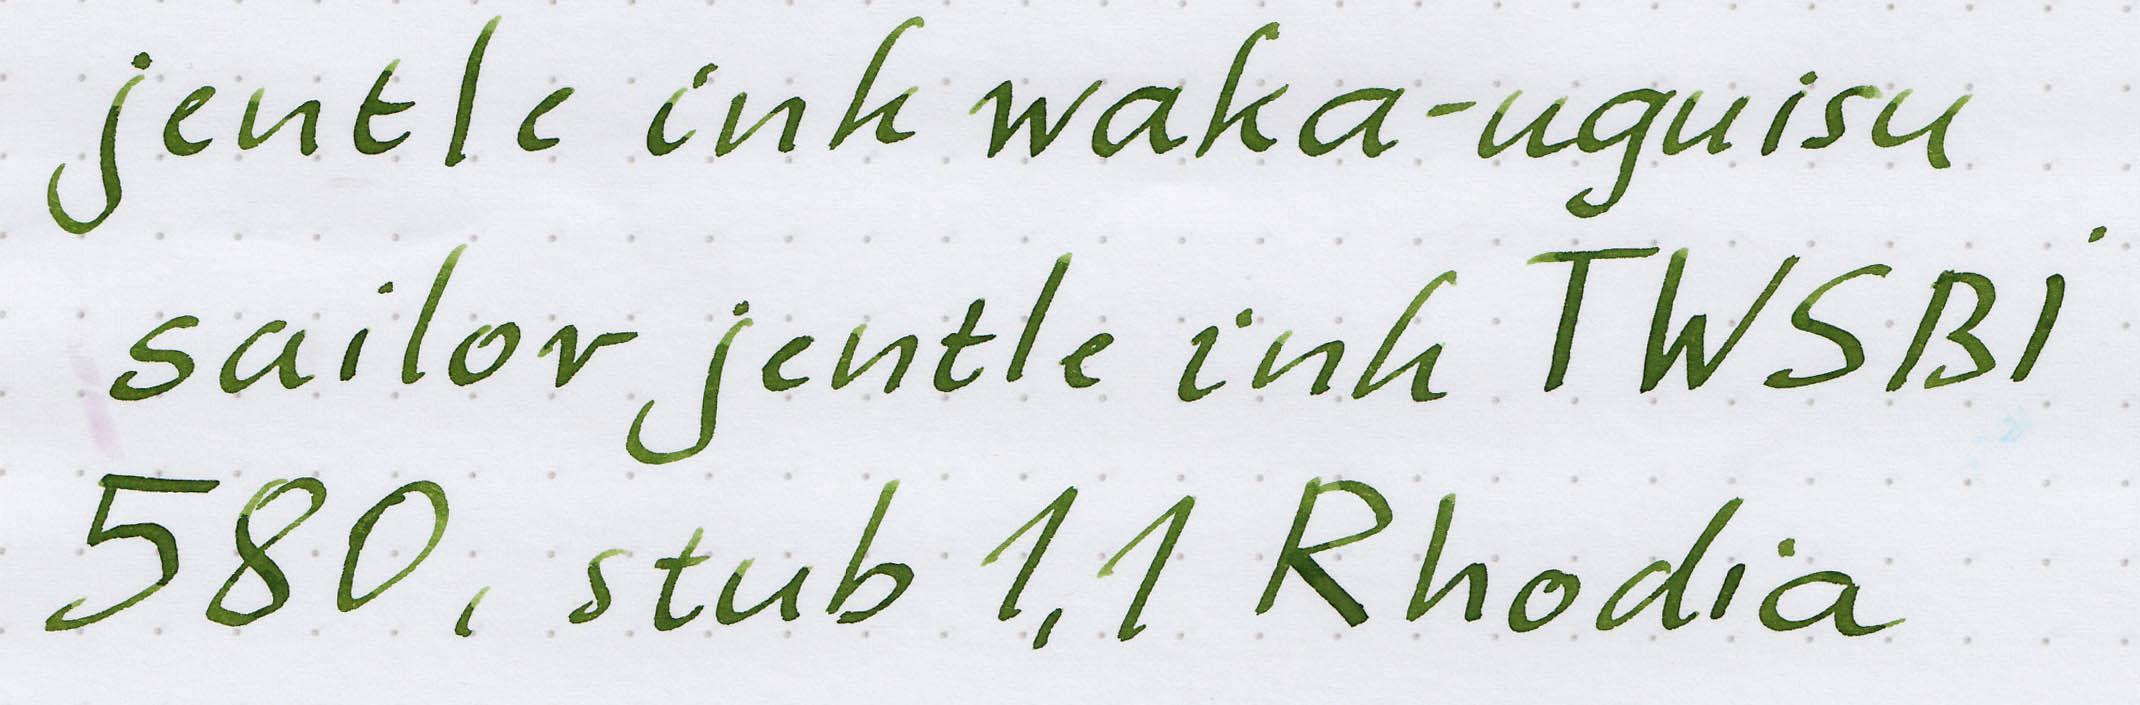 fpn_1479748996__wakauguisu_rhodia.jpg